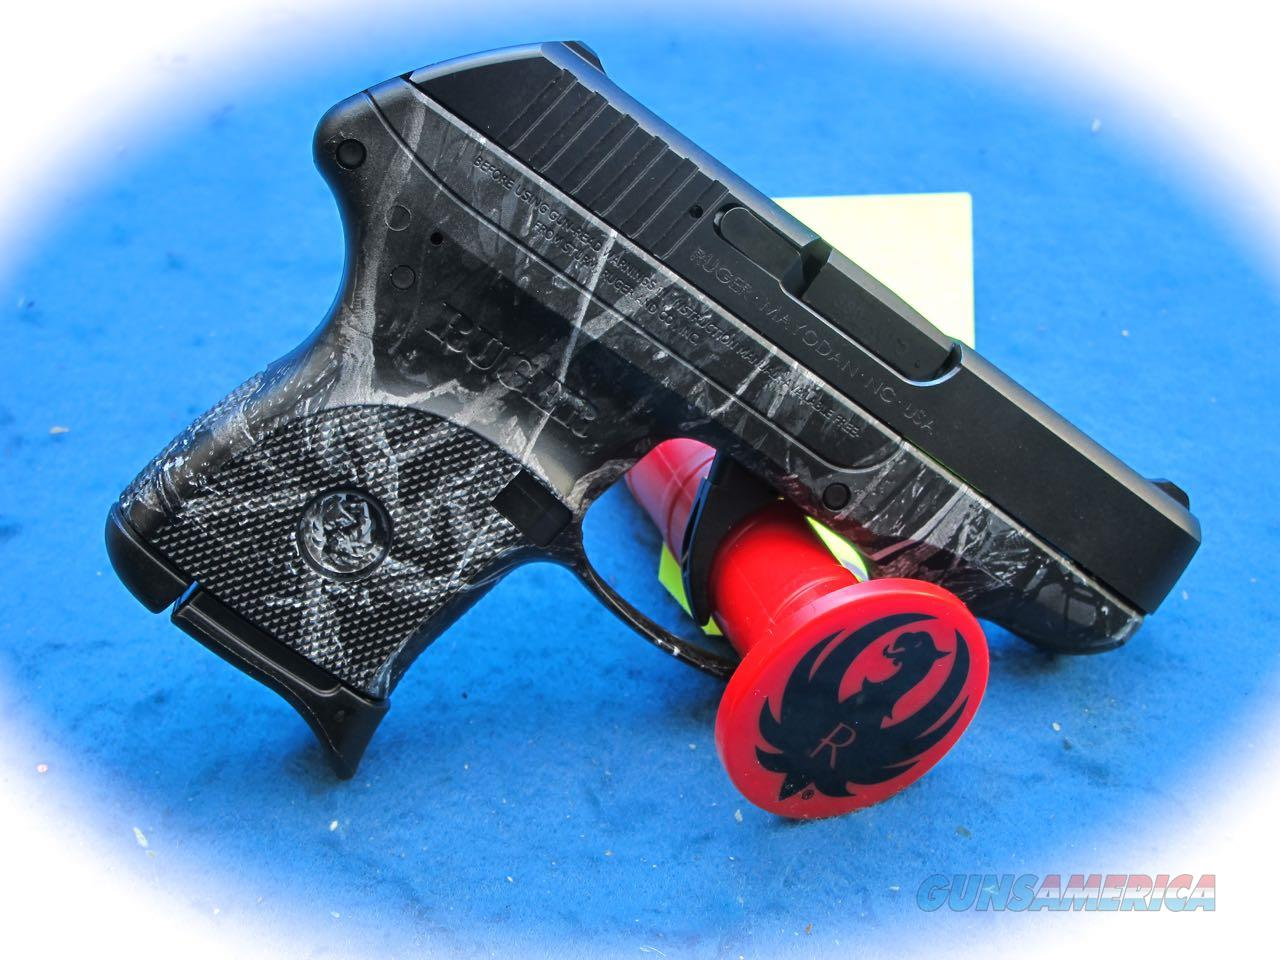 Ruger LCP  .380 ACP Semi Auto Pistol Moonshine Harvest Moon Model 3763 **New** P  Guns > Pistols > Ruger Semi-Auto Pistols > LCP